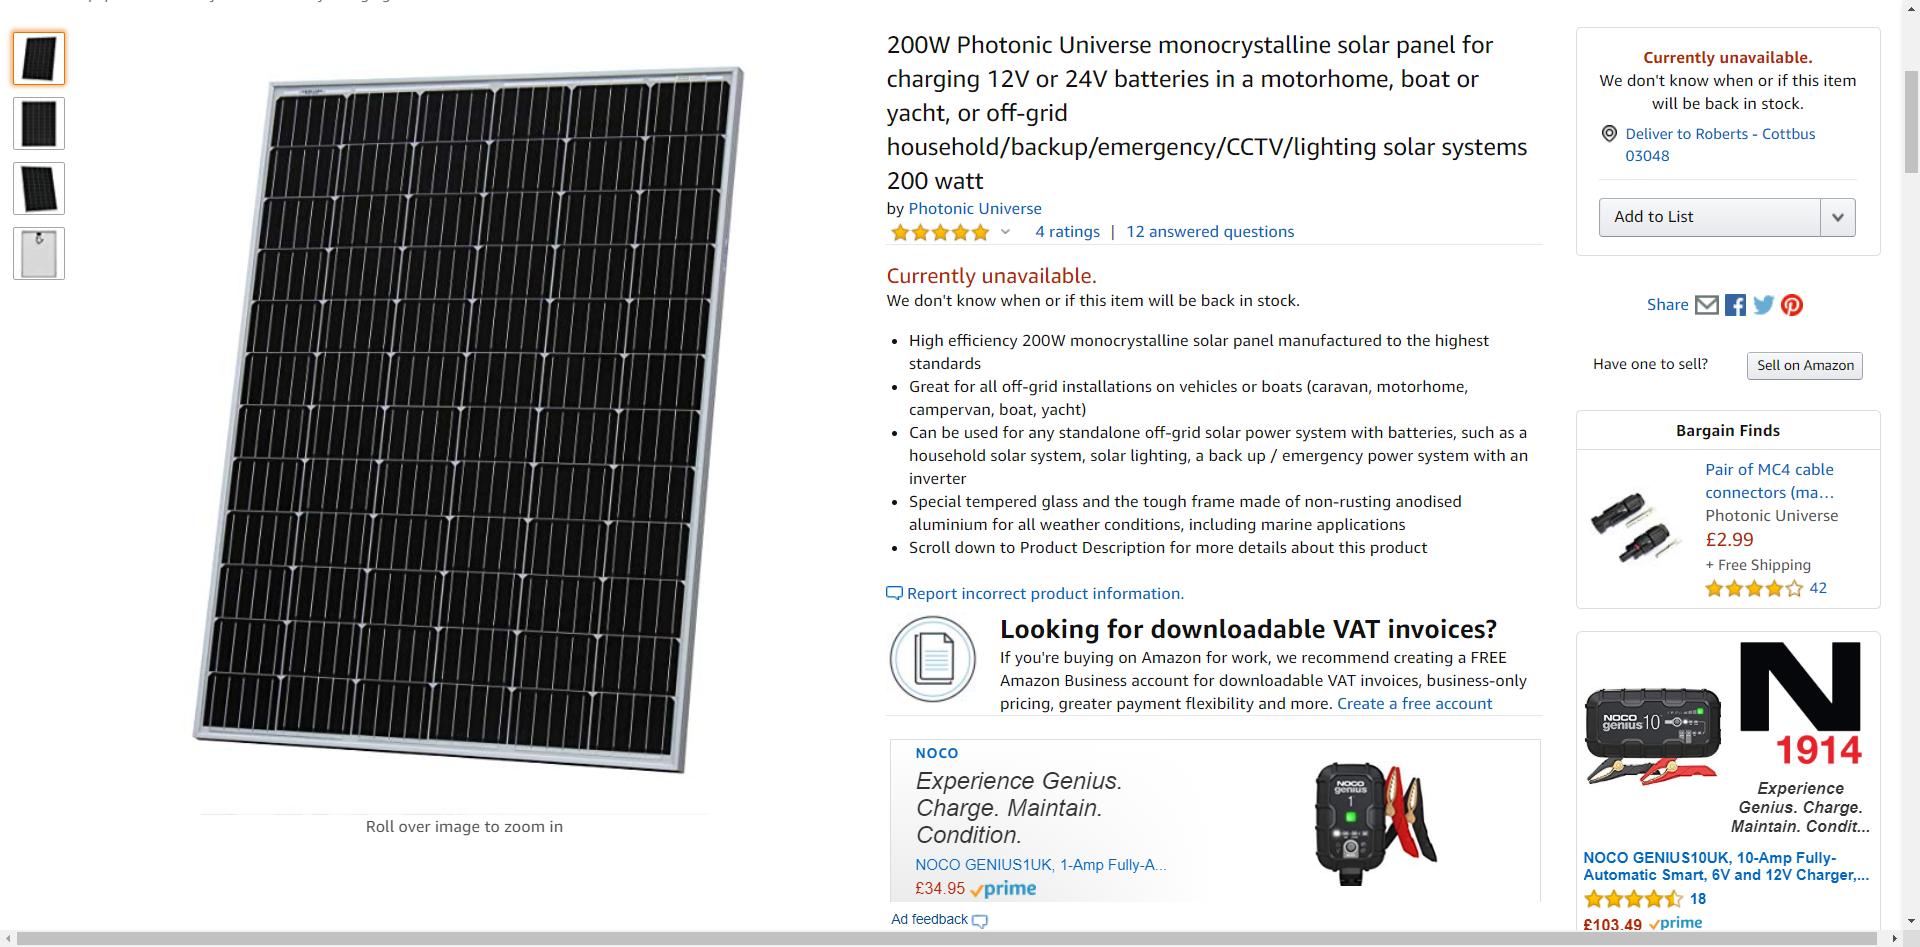 200w Photonic Universe Monocrystalline Solar Panel For Amazon Co Uk Electronics In 2020 Monocrystalline Solar Panels Solar Panels Emergency Power